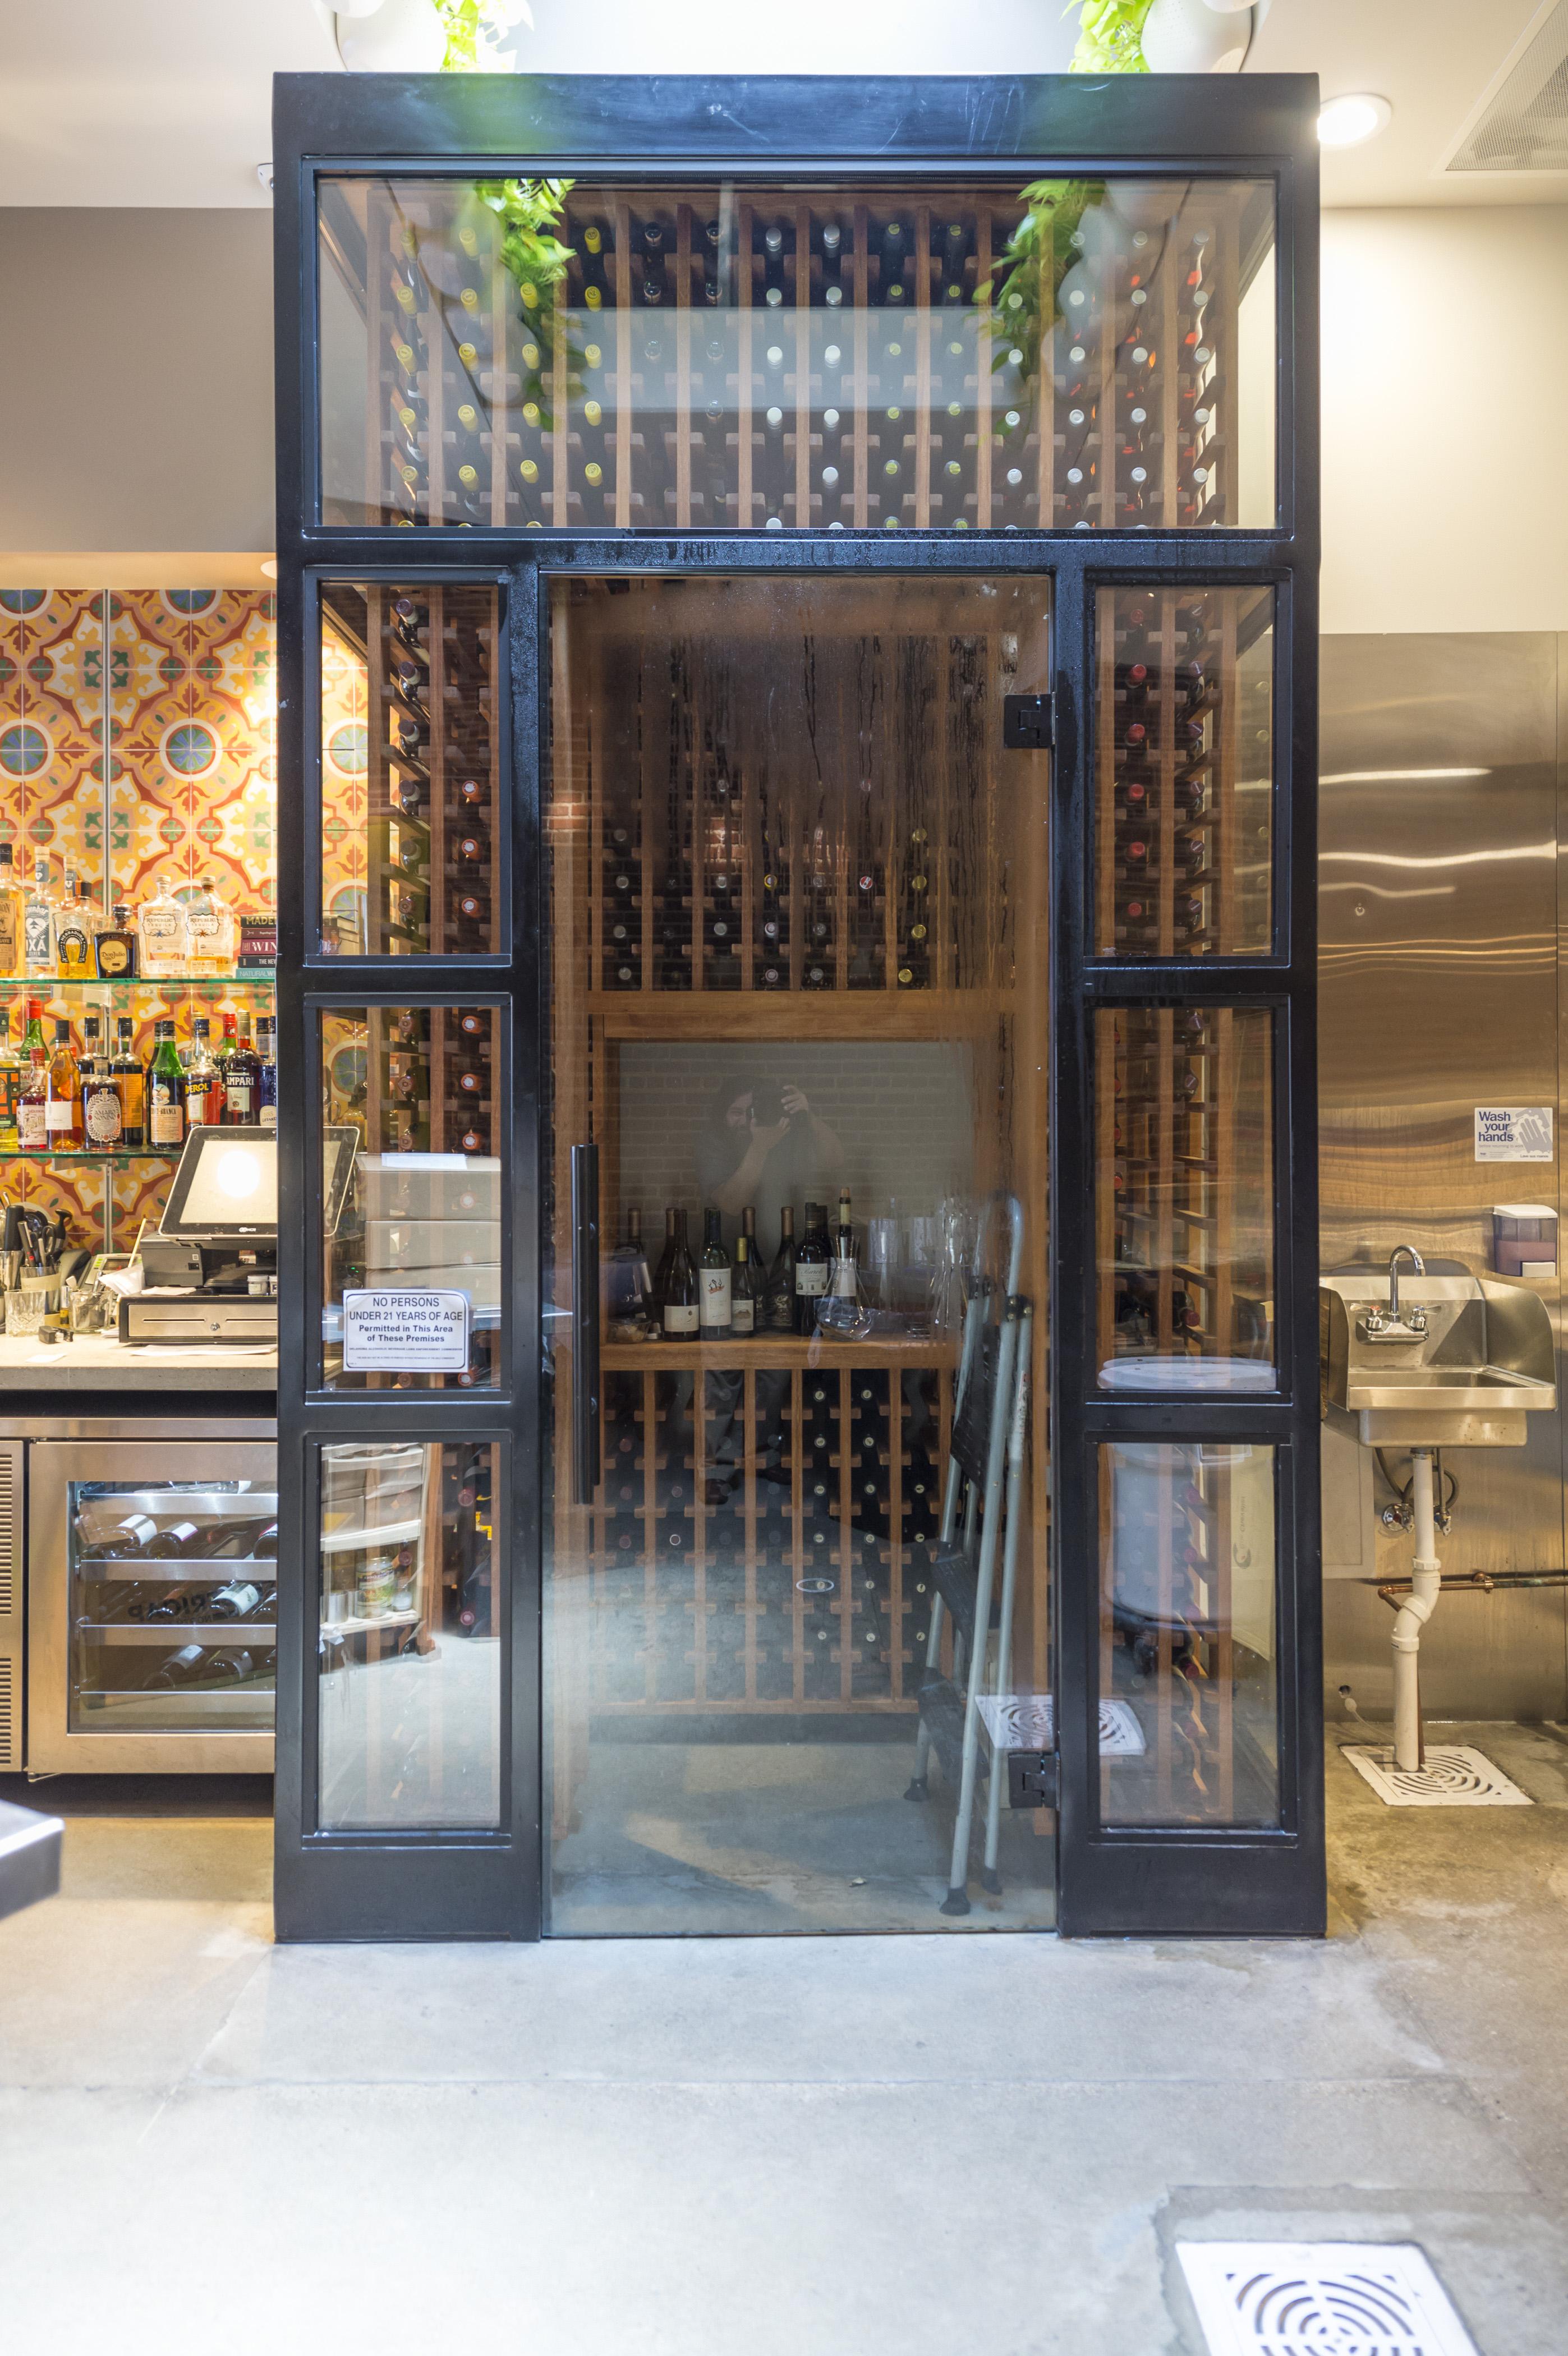 06 12 2017 Amelia's restaurant SILO EC0031